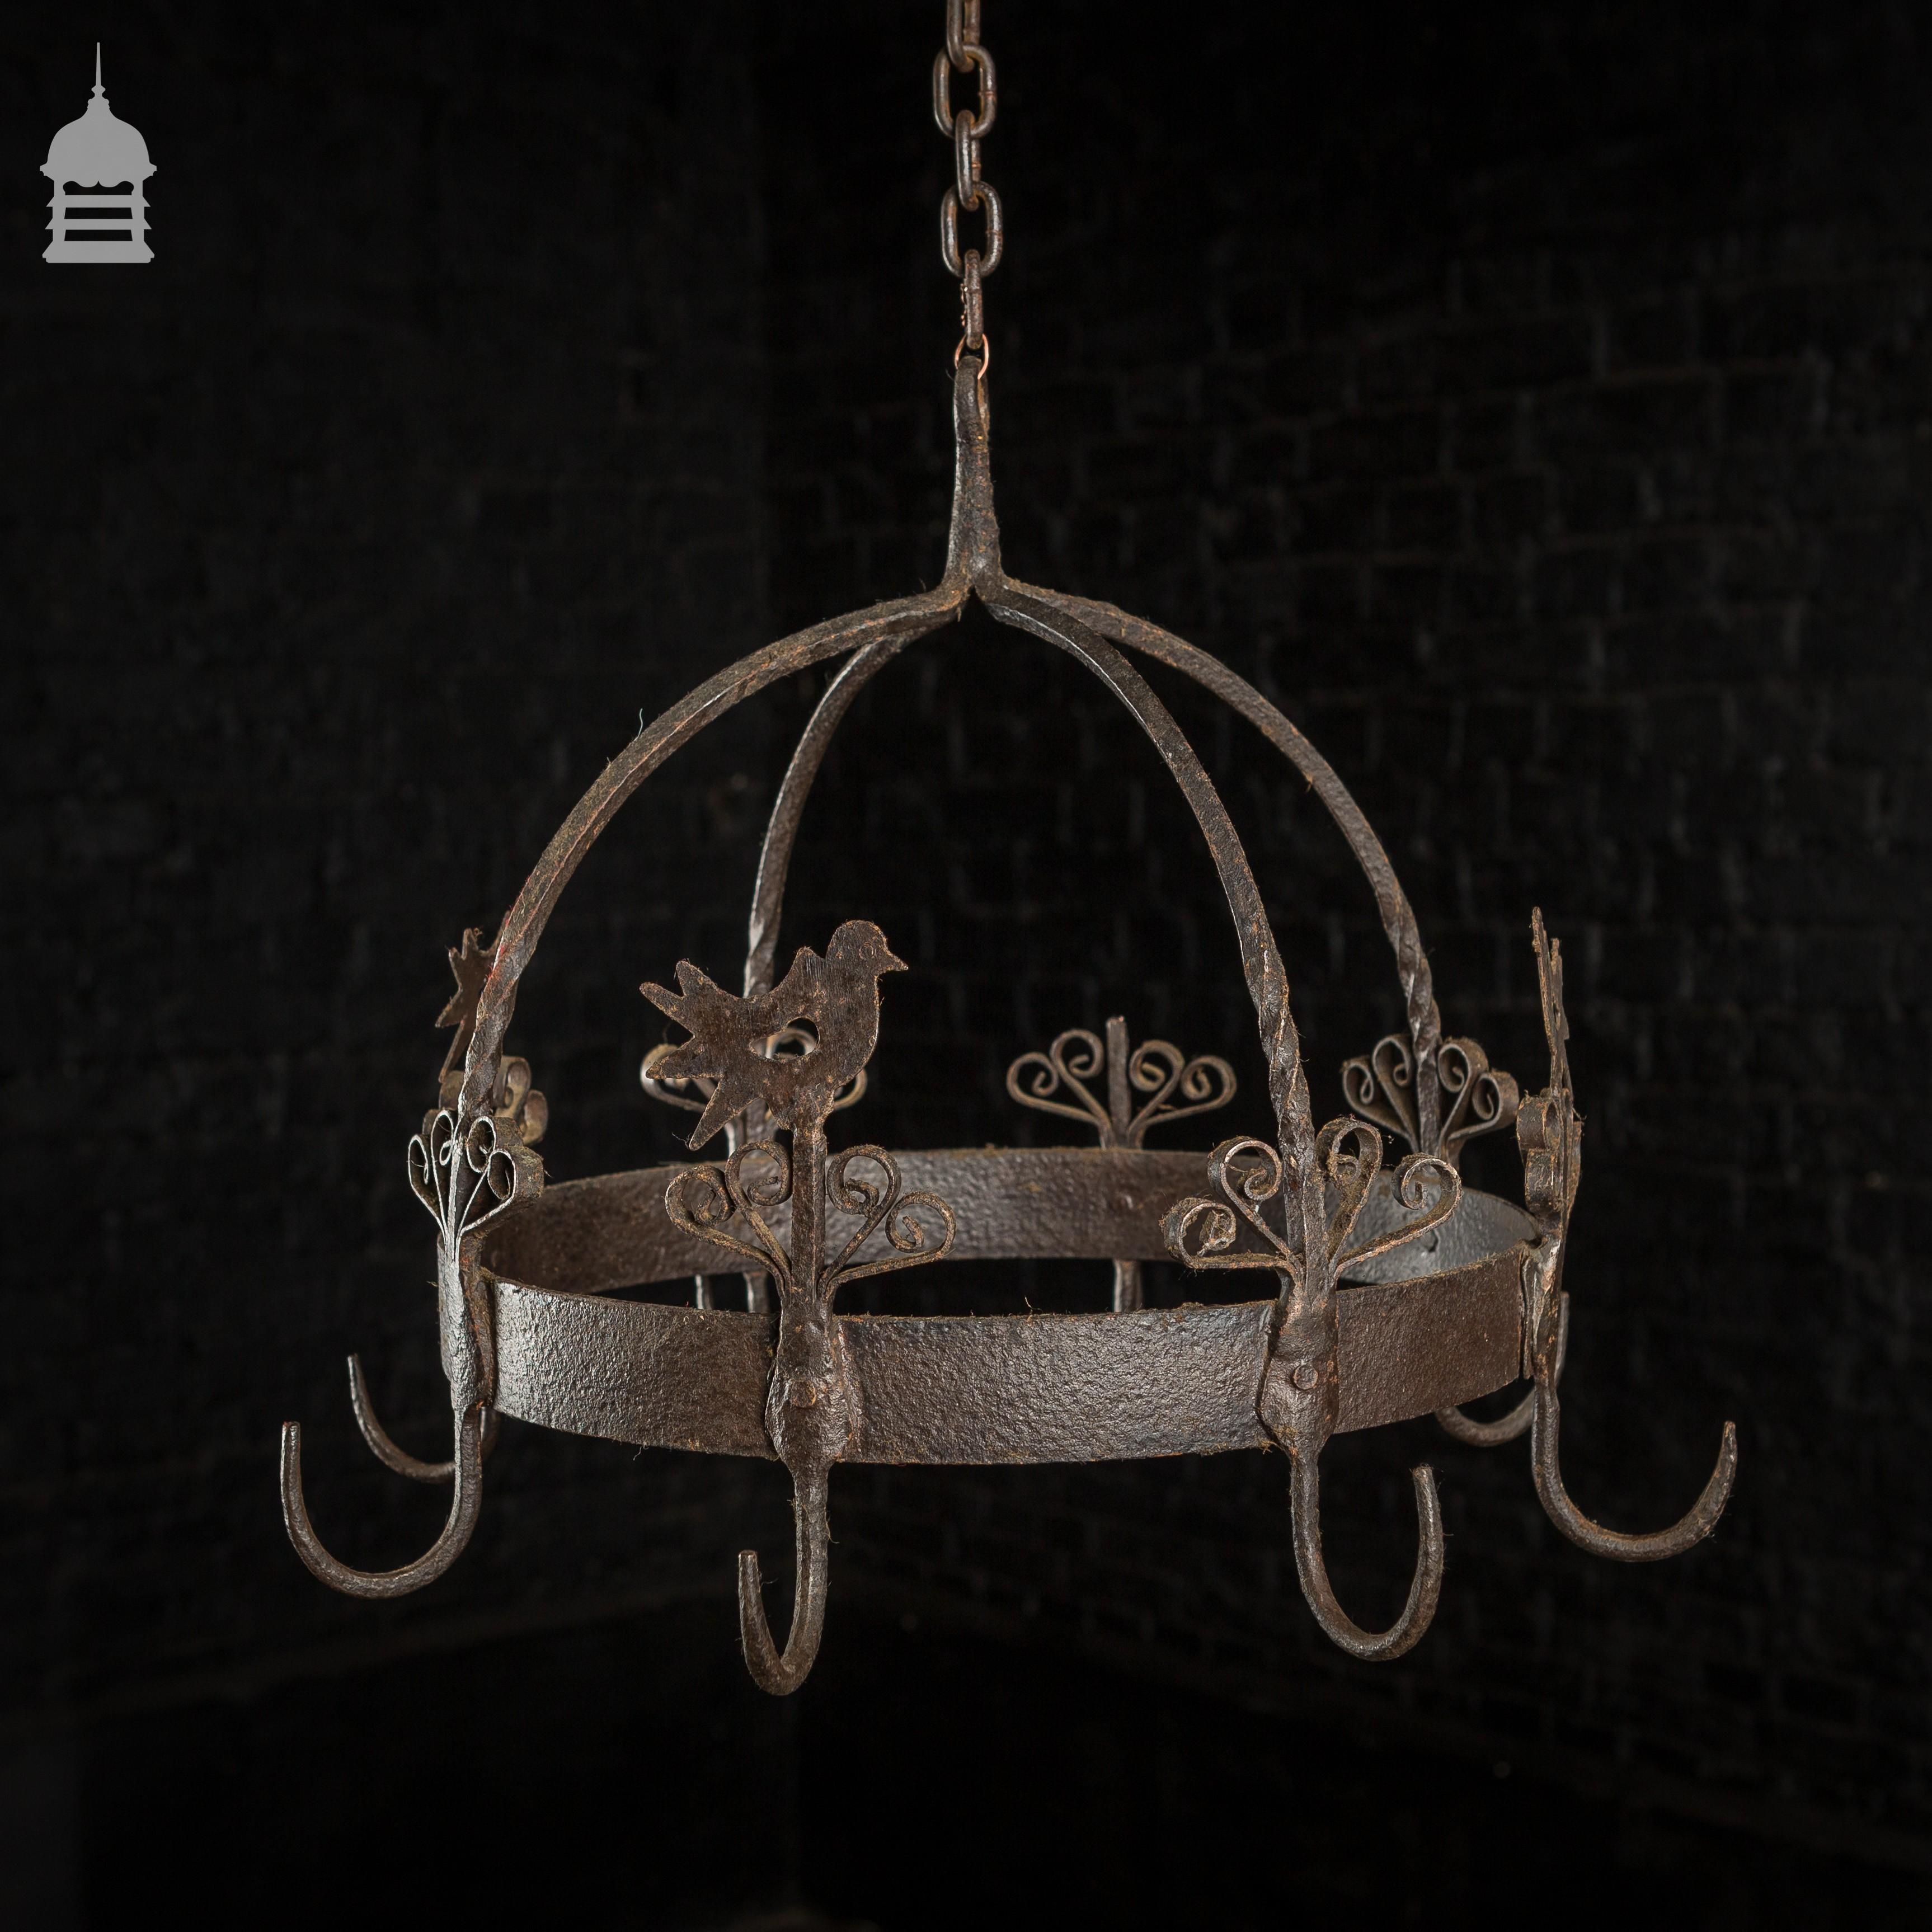 Game Hook Blacksmith made in England